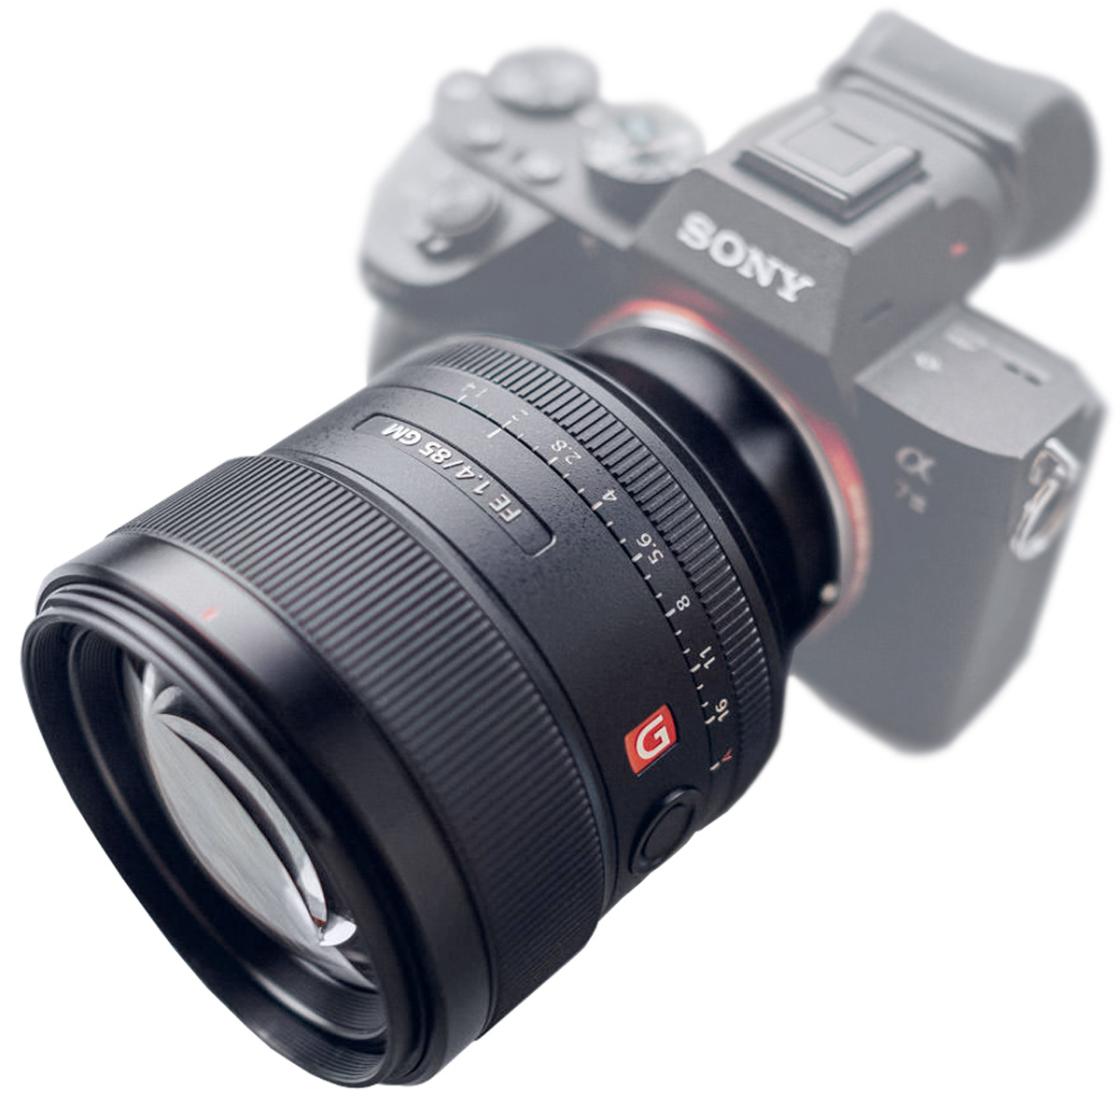 Sony 85mm F1.4 GM E-mount Vollformat